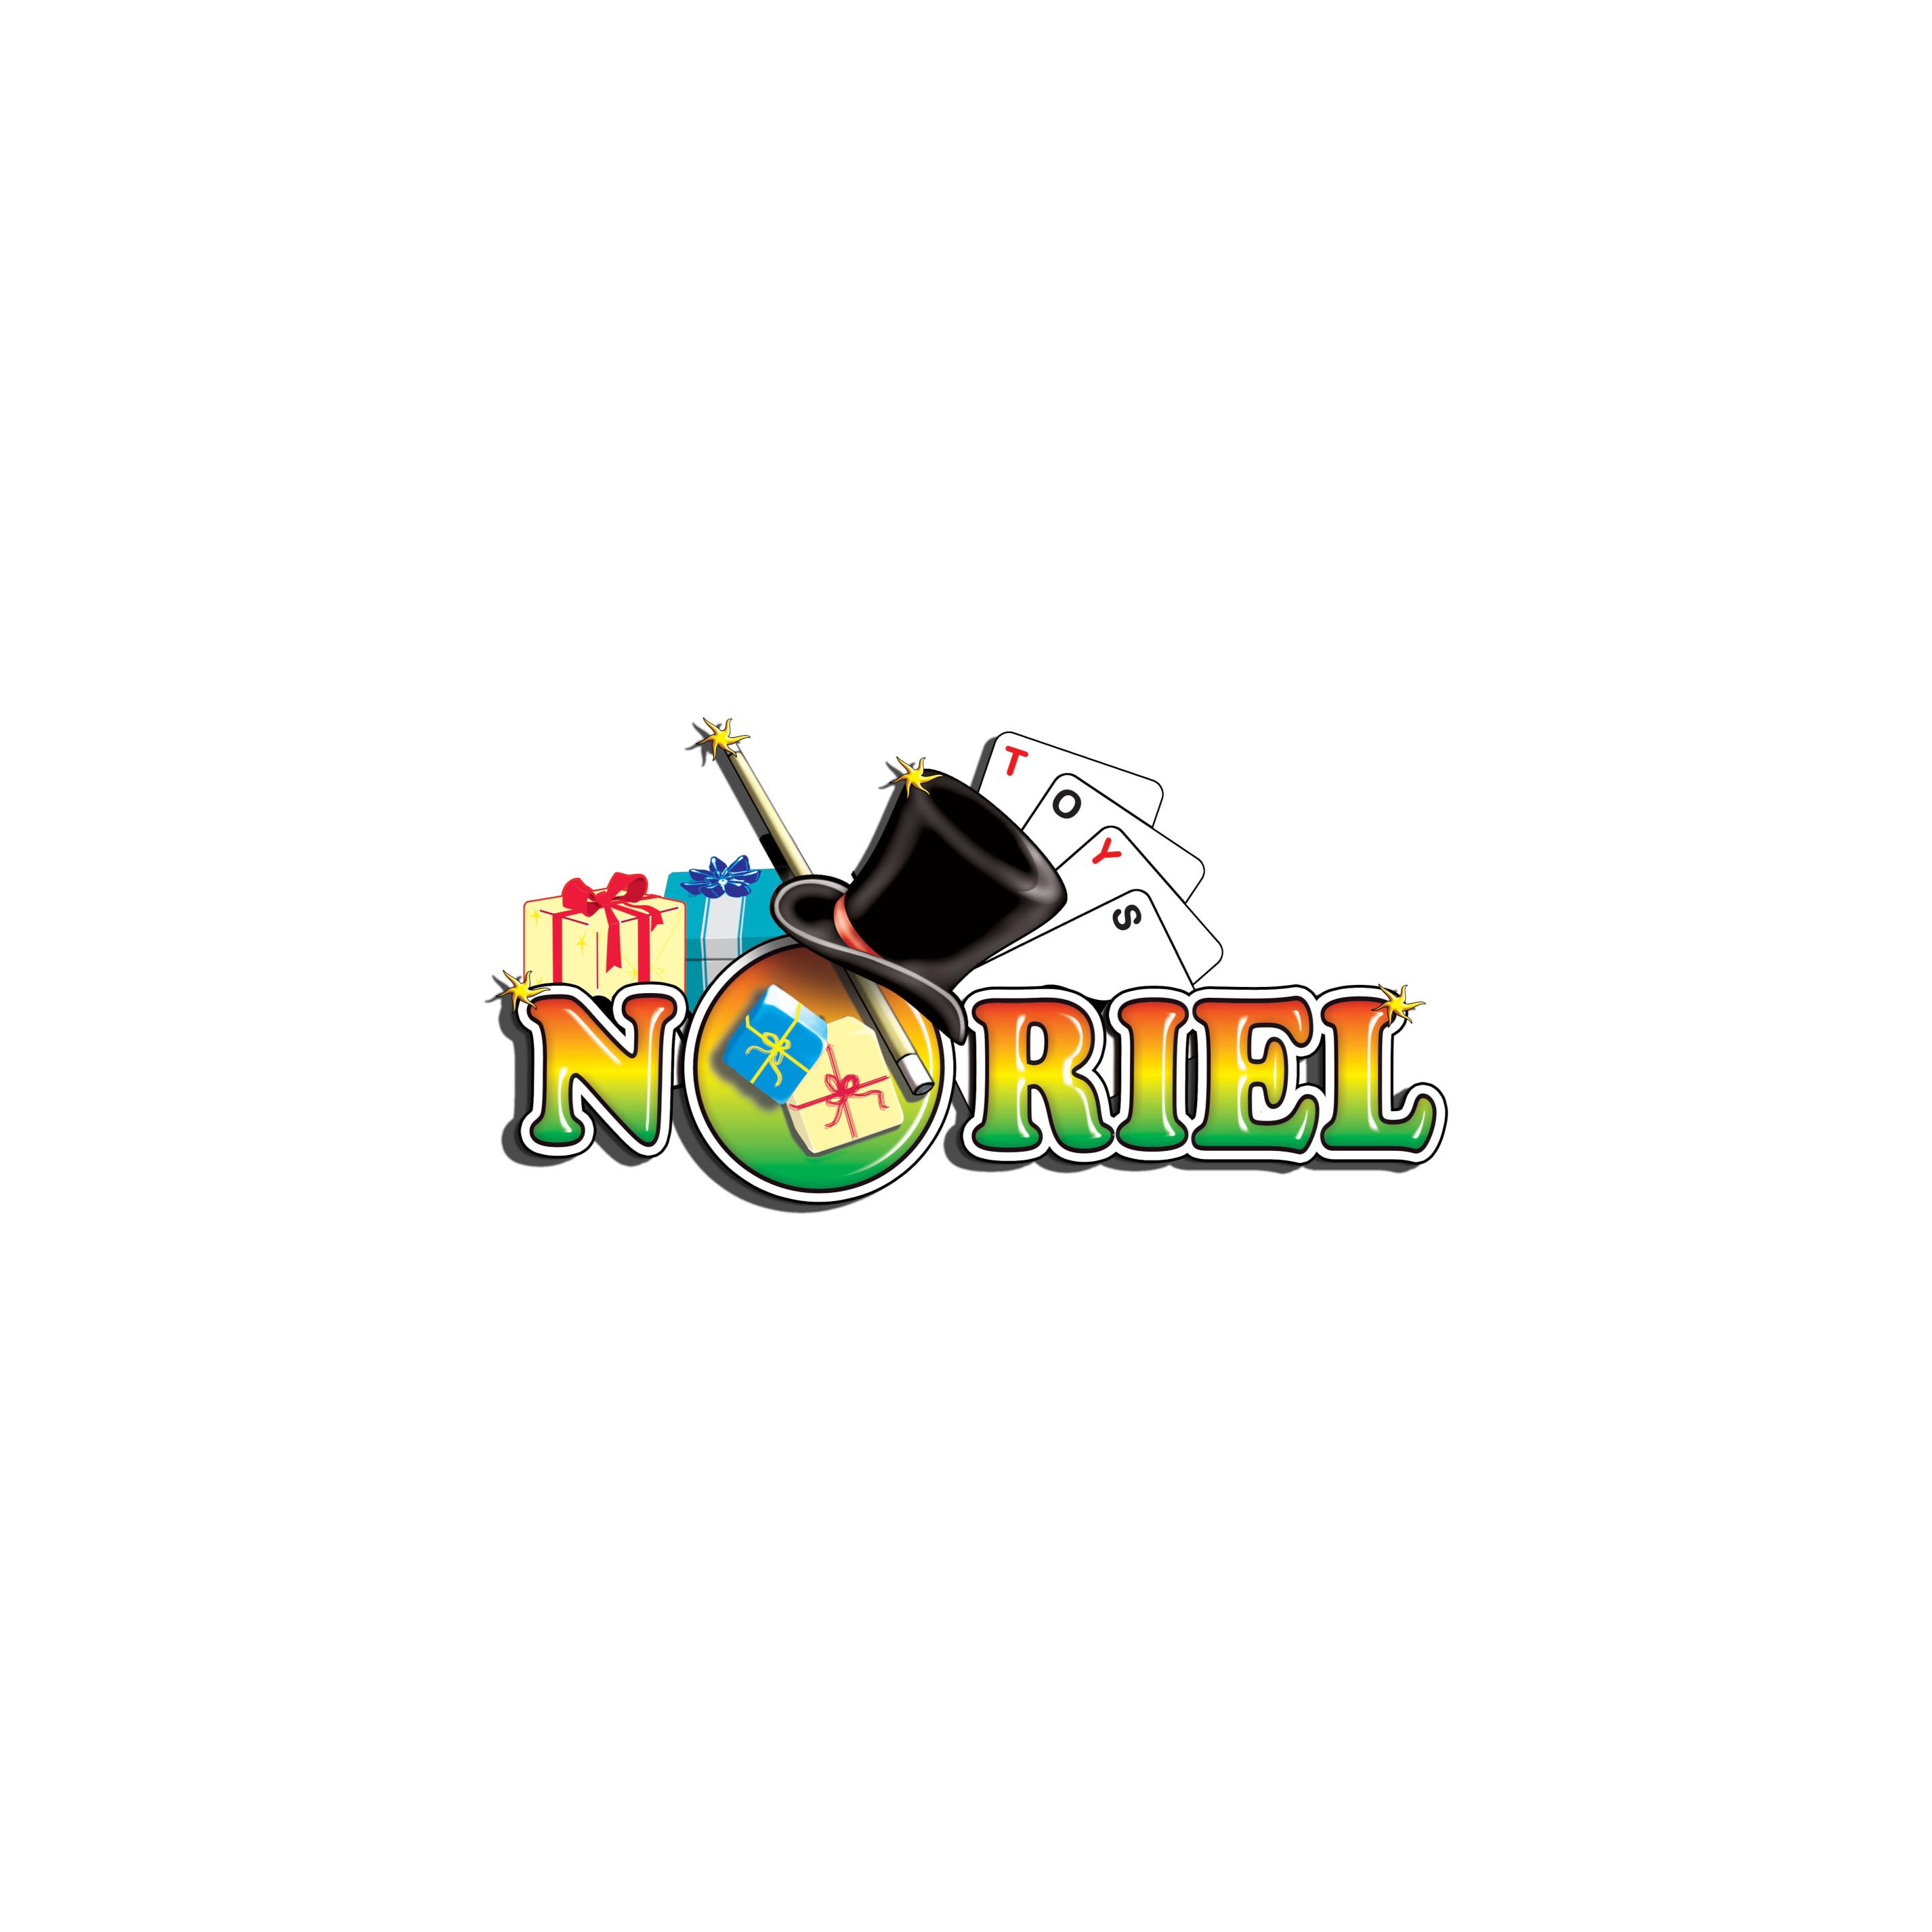 JUN.1094_001w Carte Editura Corint, Vanatorii de comori vol. 4 Primejdii in varful lumii, James Patterson, Chris Grabenstein